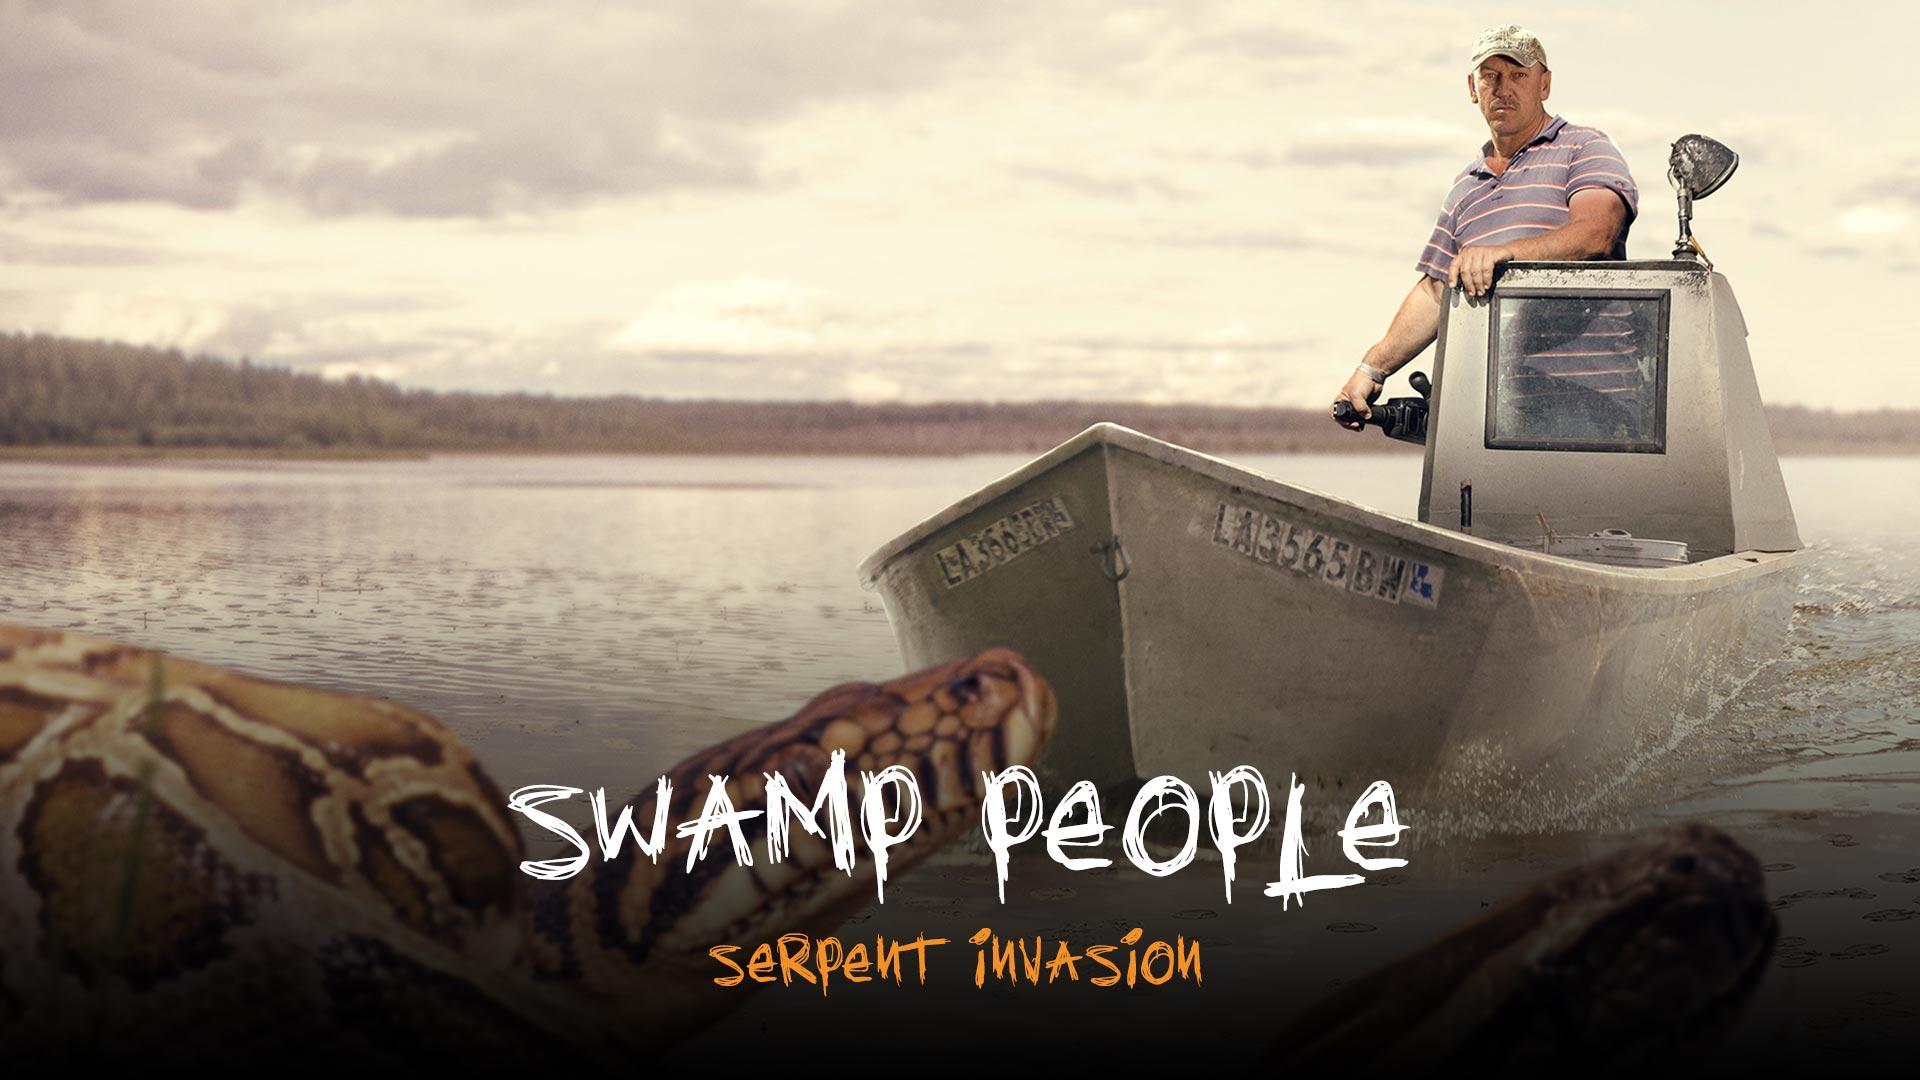 Swamp People: Serpent Invasion Season 1